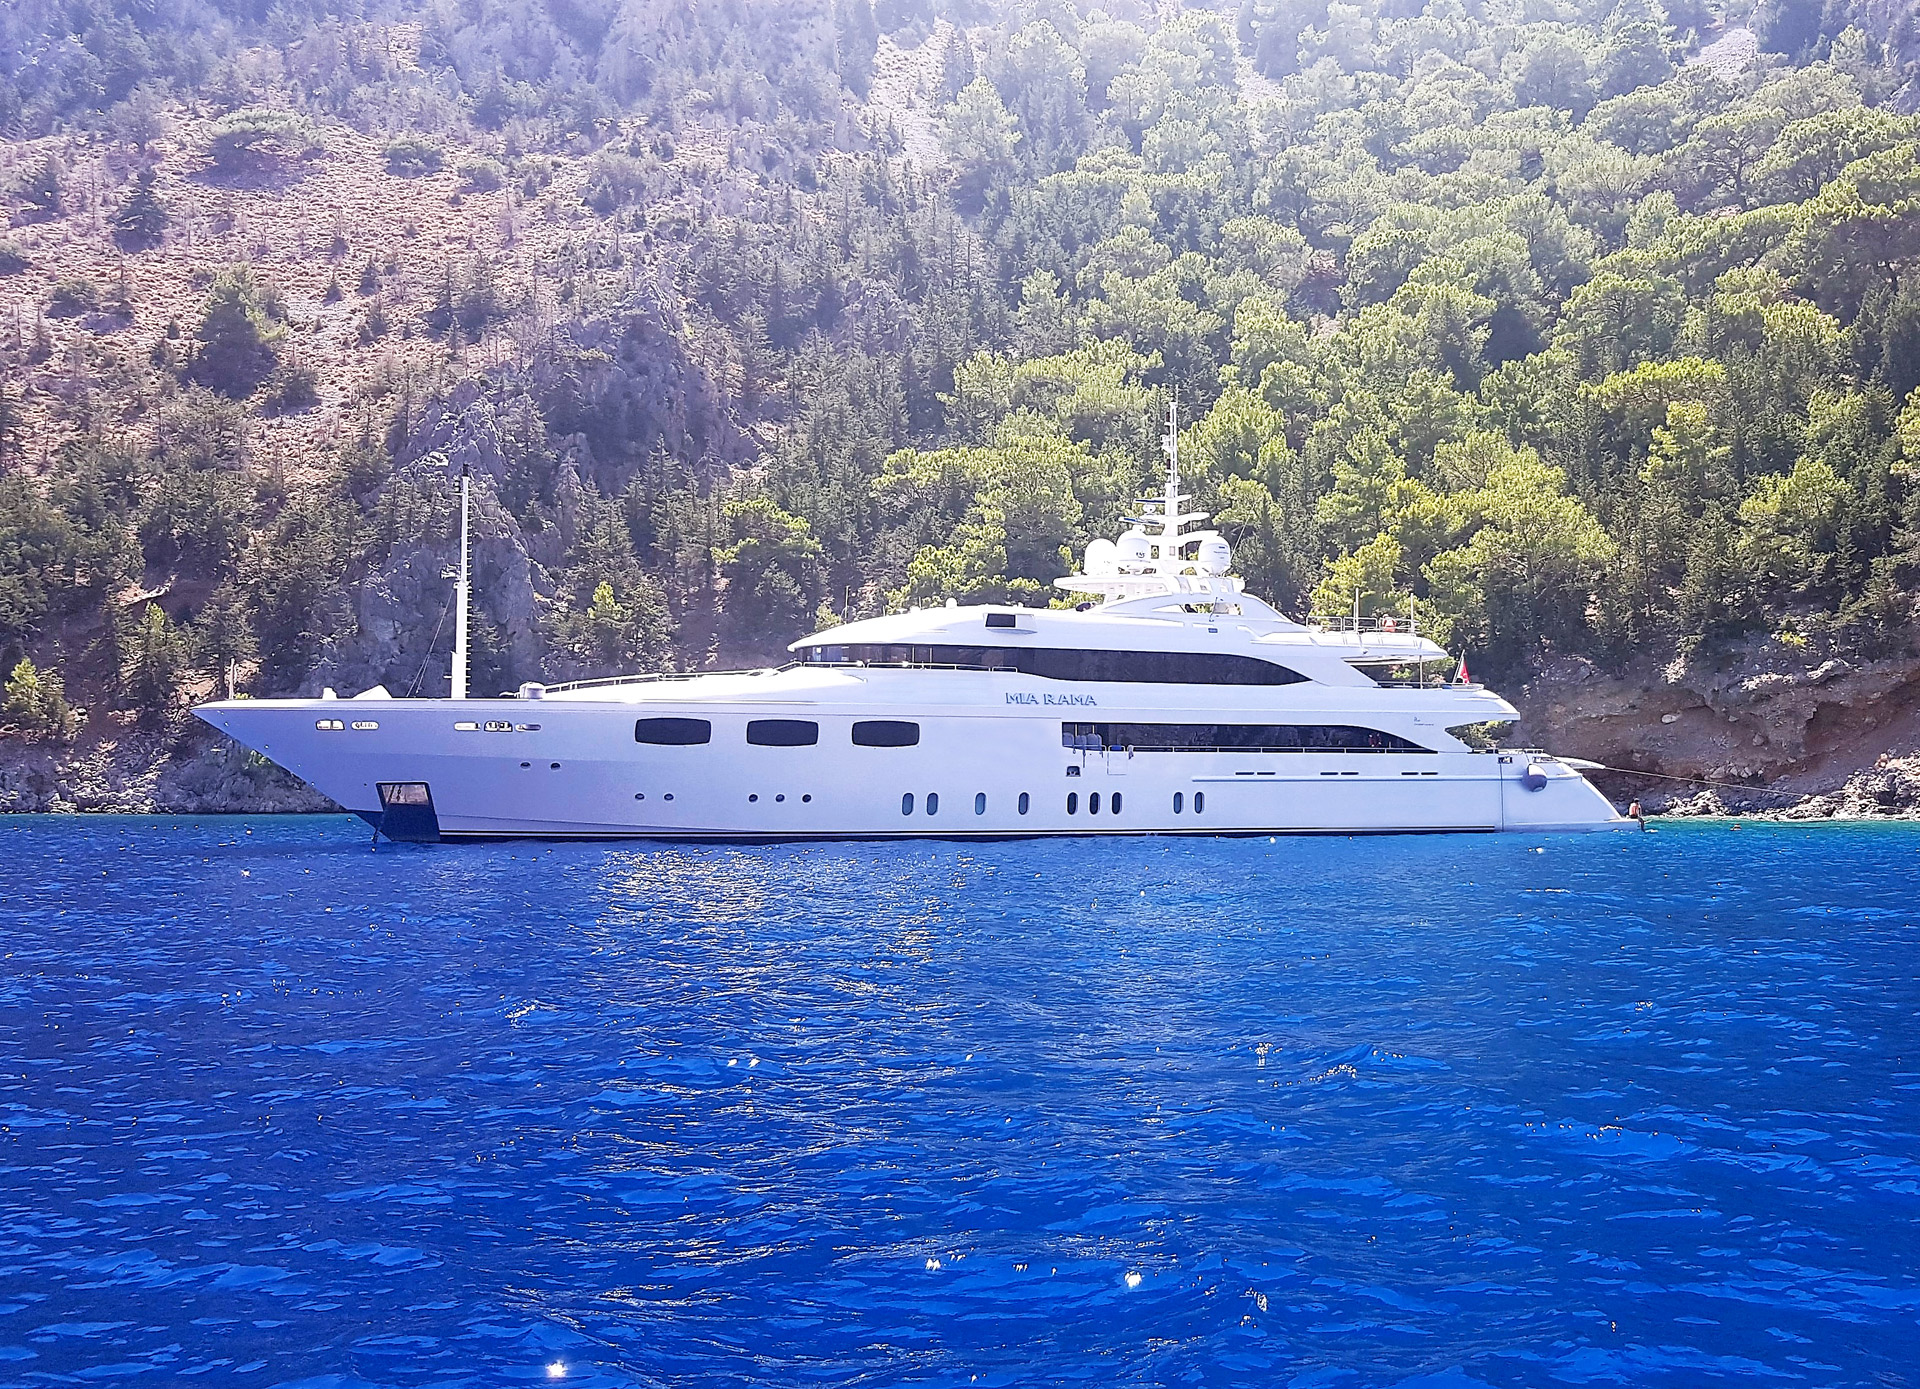 mia-rama-yacht-for-sale-for-charter-01.jpg